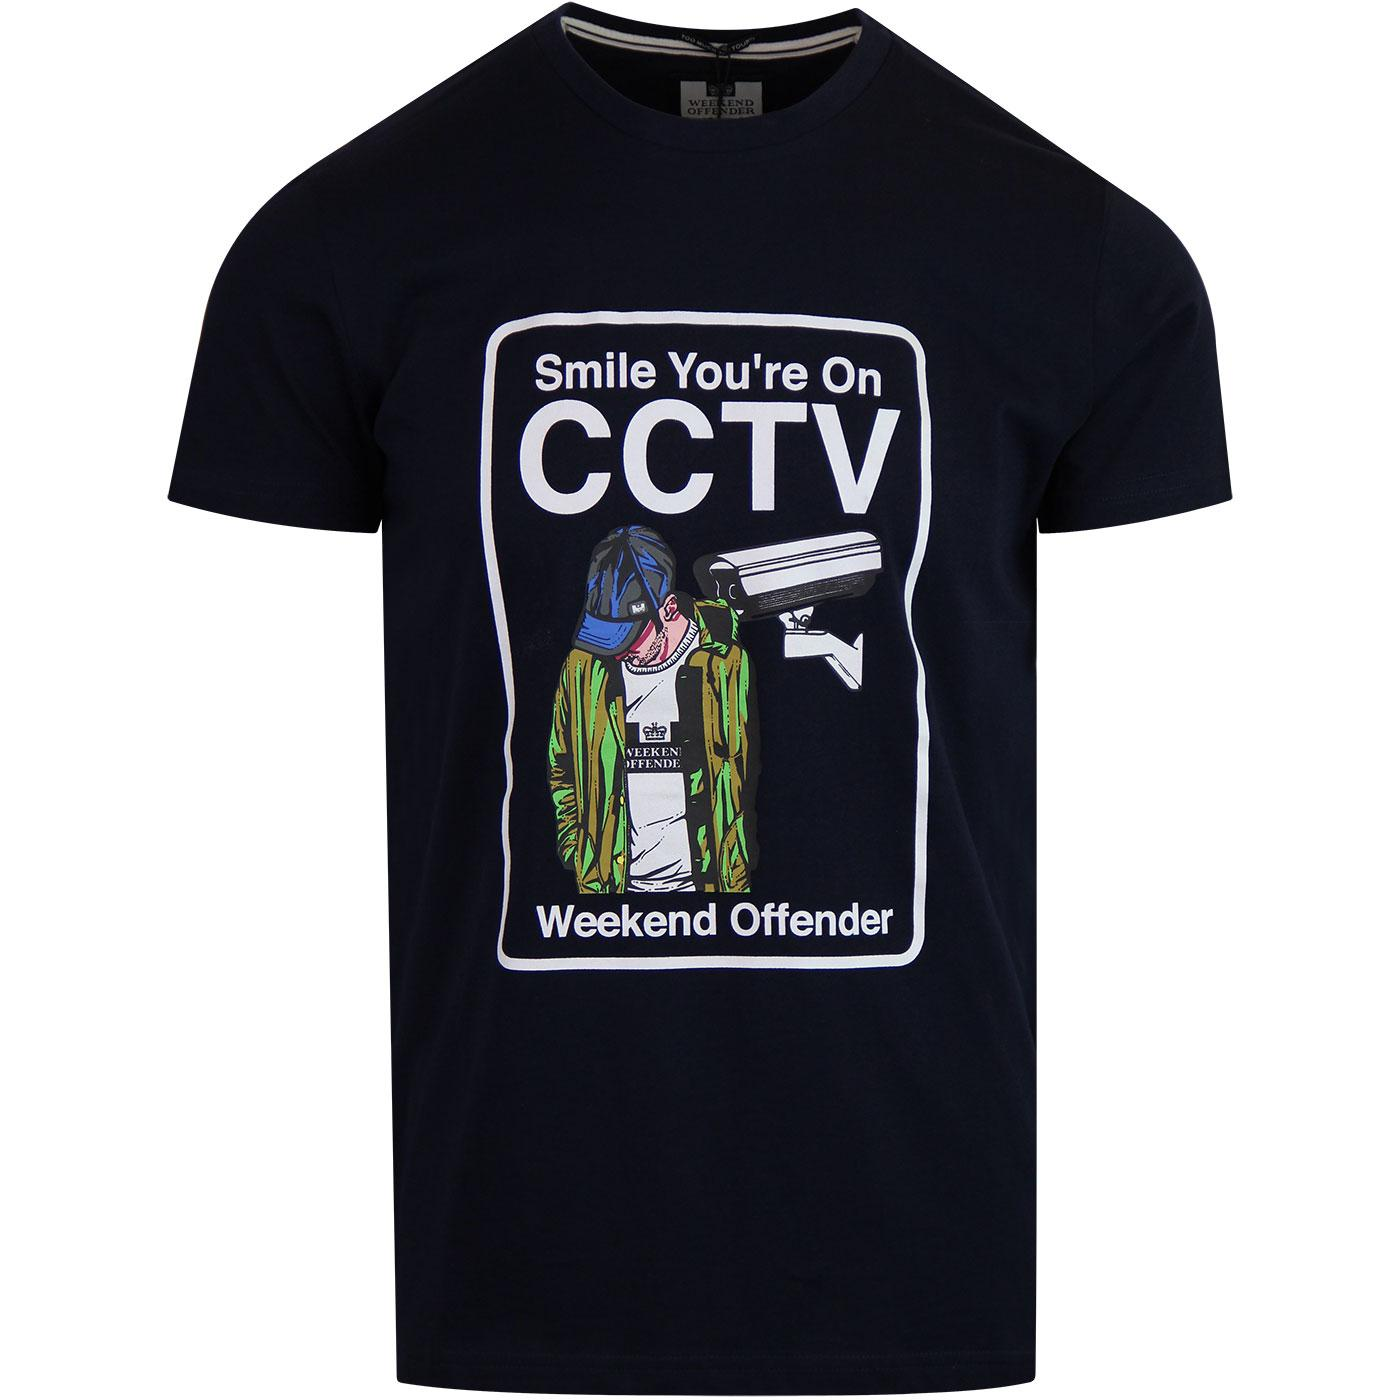 CCTV WEEKEND OFFENDER Men's Graphic Logo Tee